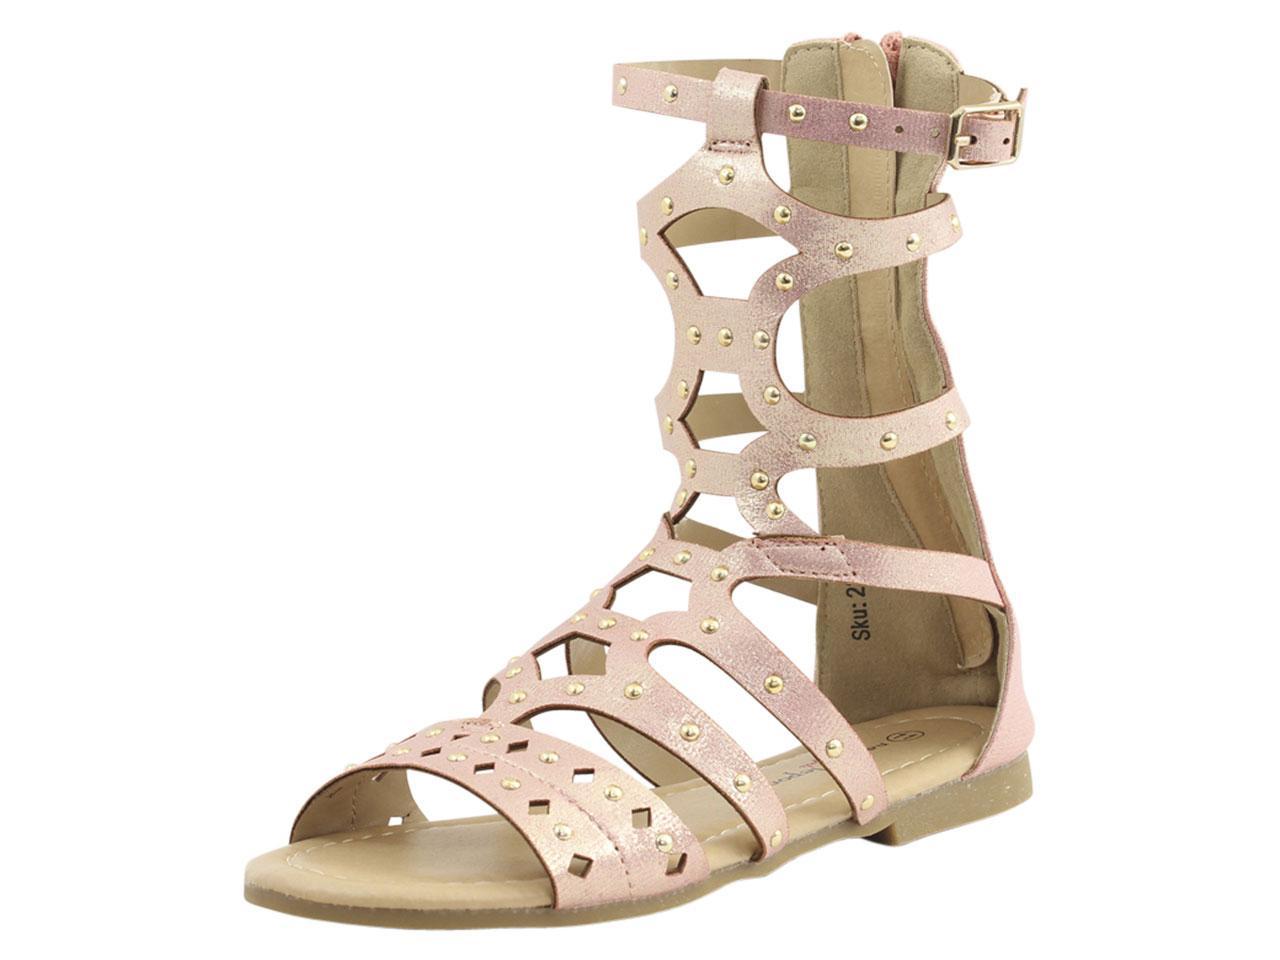 Image of Nanette Lepore Little/Big Girl's Studded Gladiator Sandals Shoes - Pink Metallic - 11 M US Little Kid